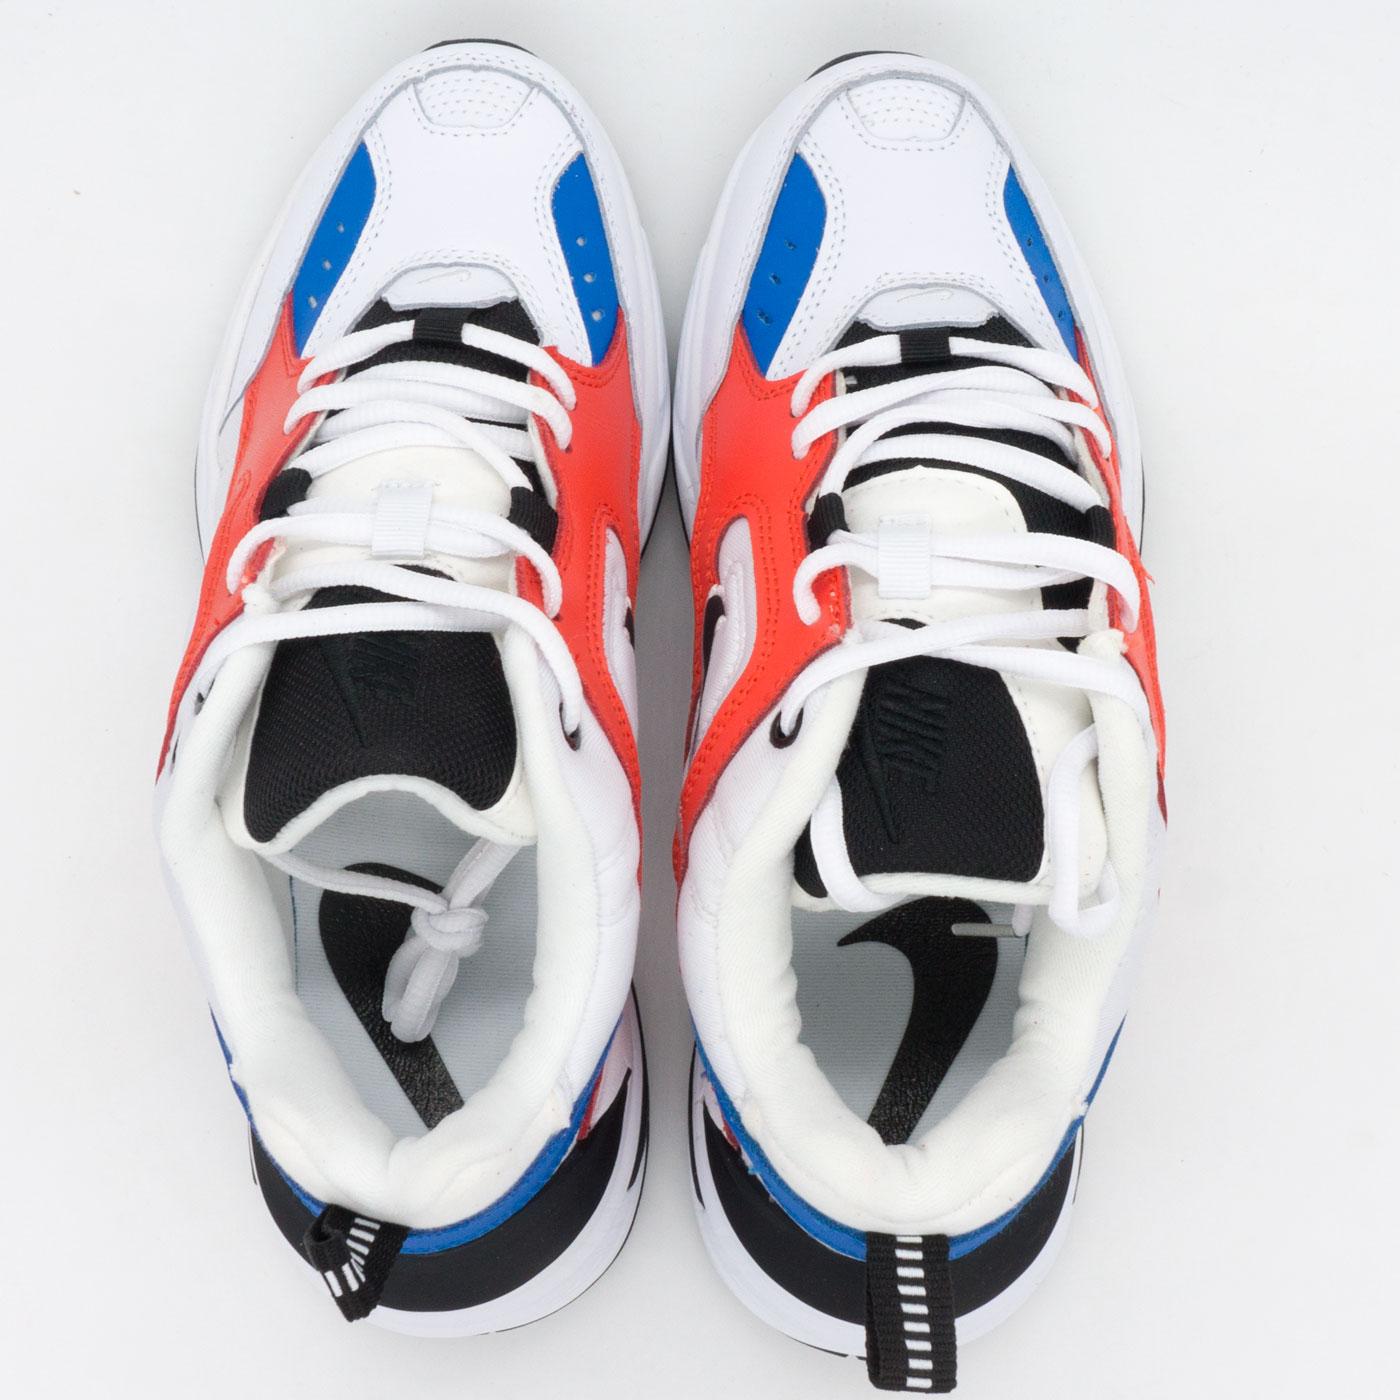 фото bottom Кроссовки Nike M2K Tekno белые с красним и синем. Топ качество! bottom